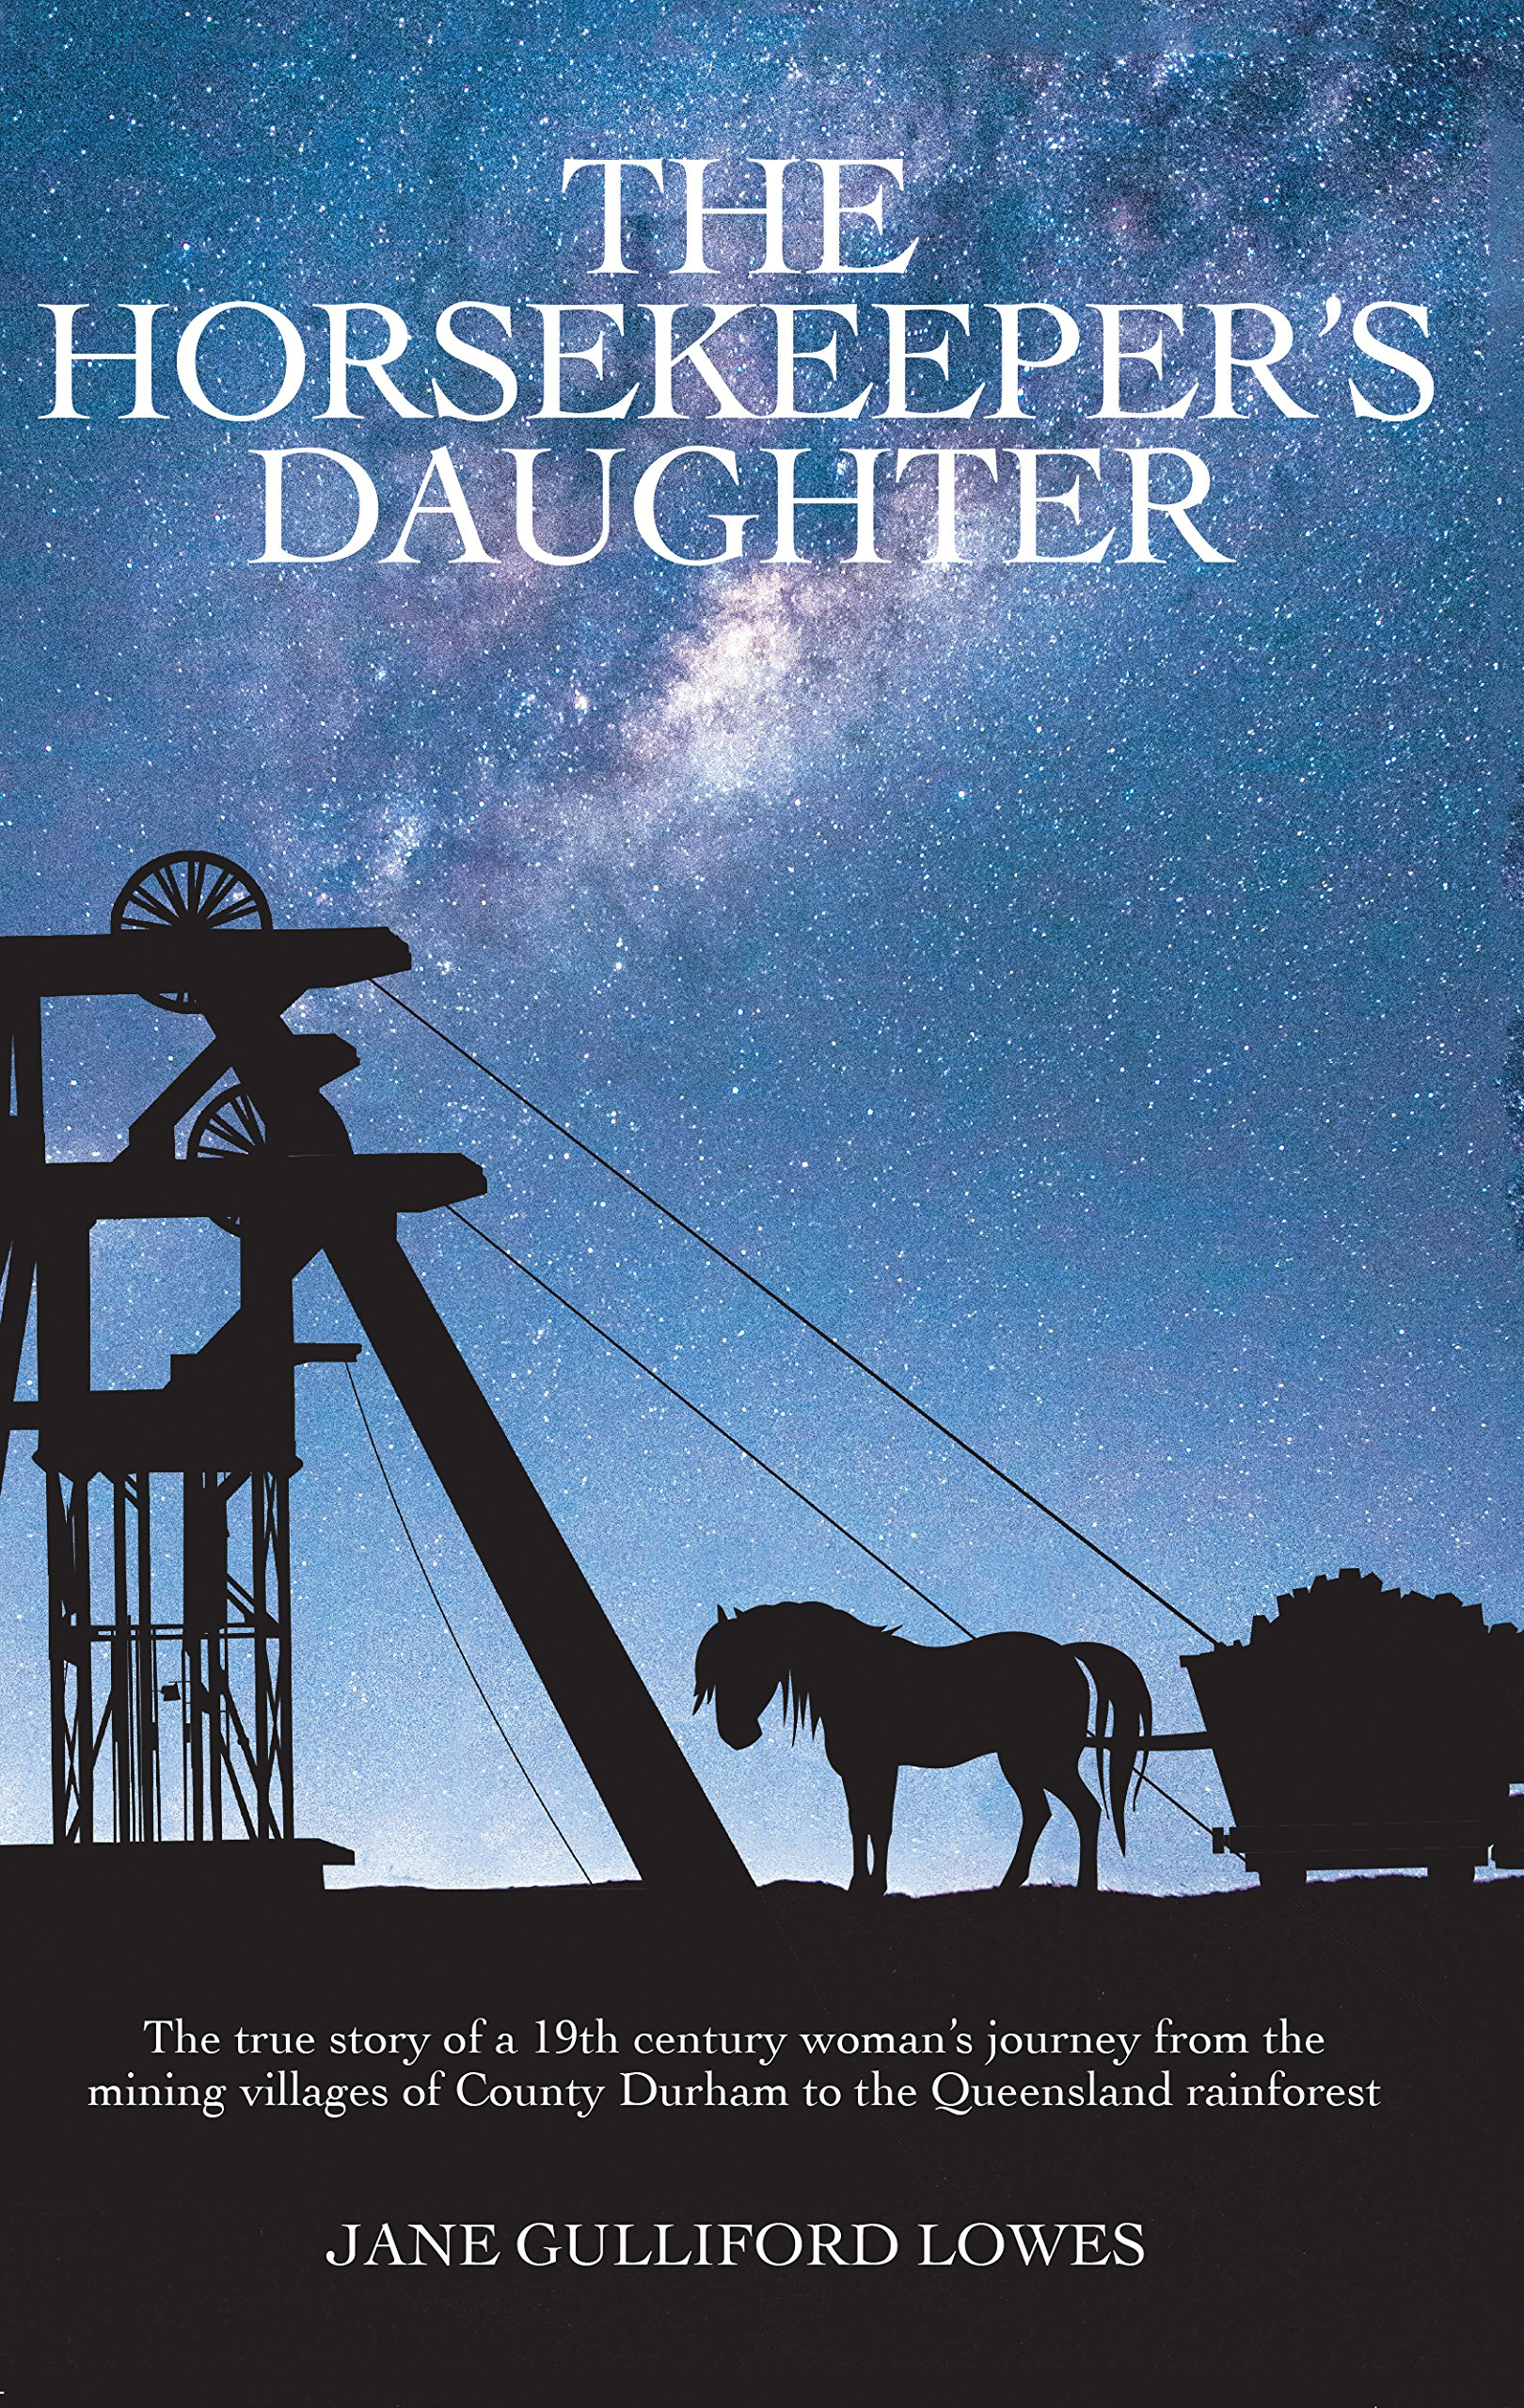 The Horsekeeper's Daughter: Amazon.co.uk: Jane Gulliford Lowes:  9781788039741: Books